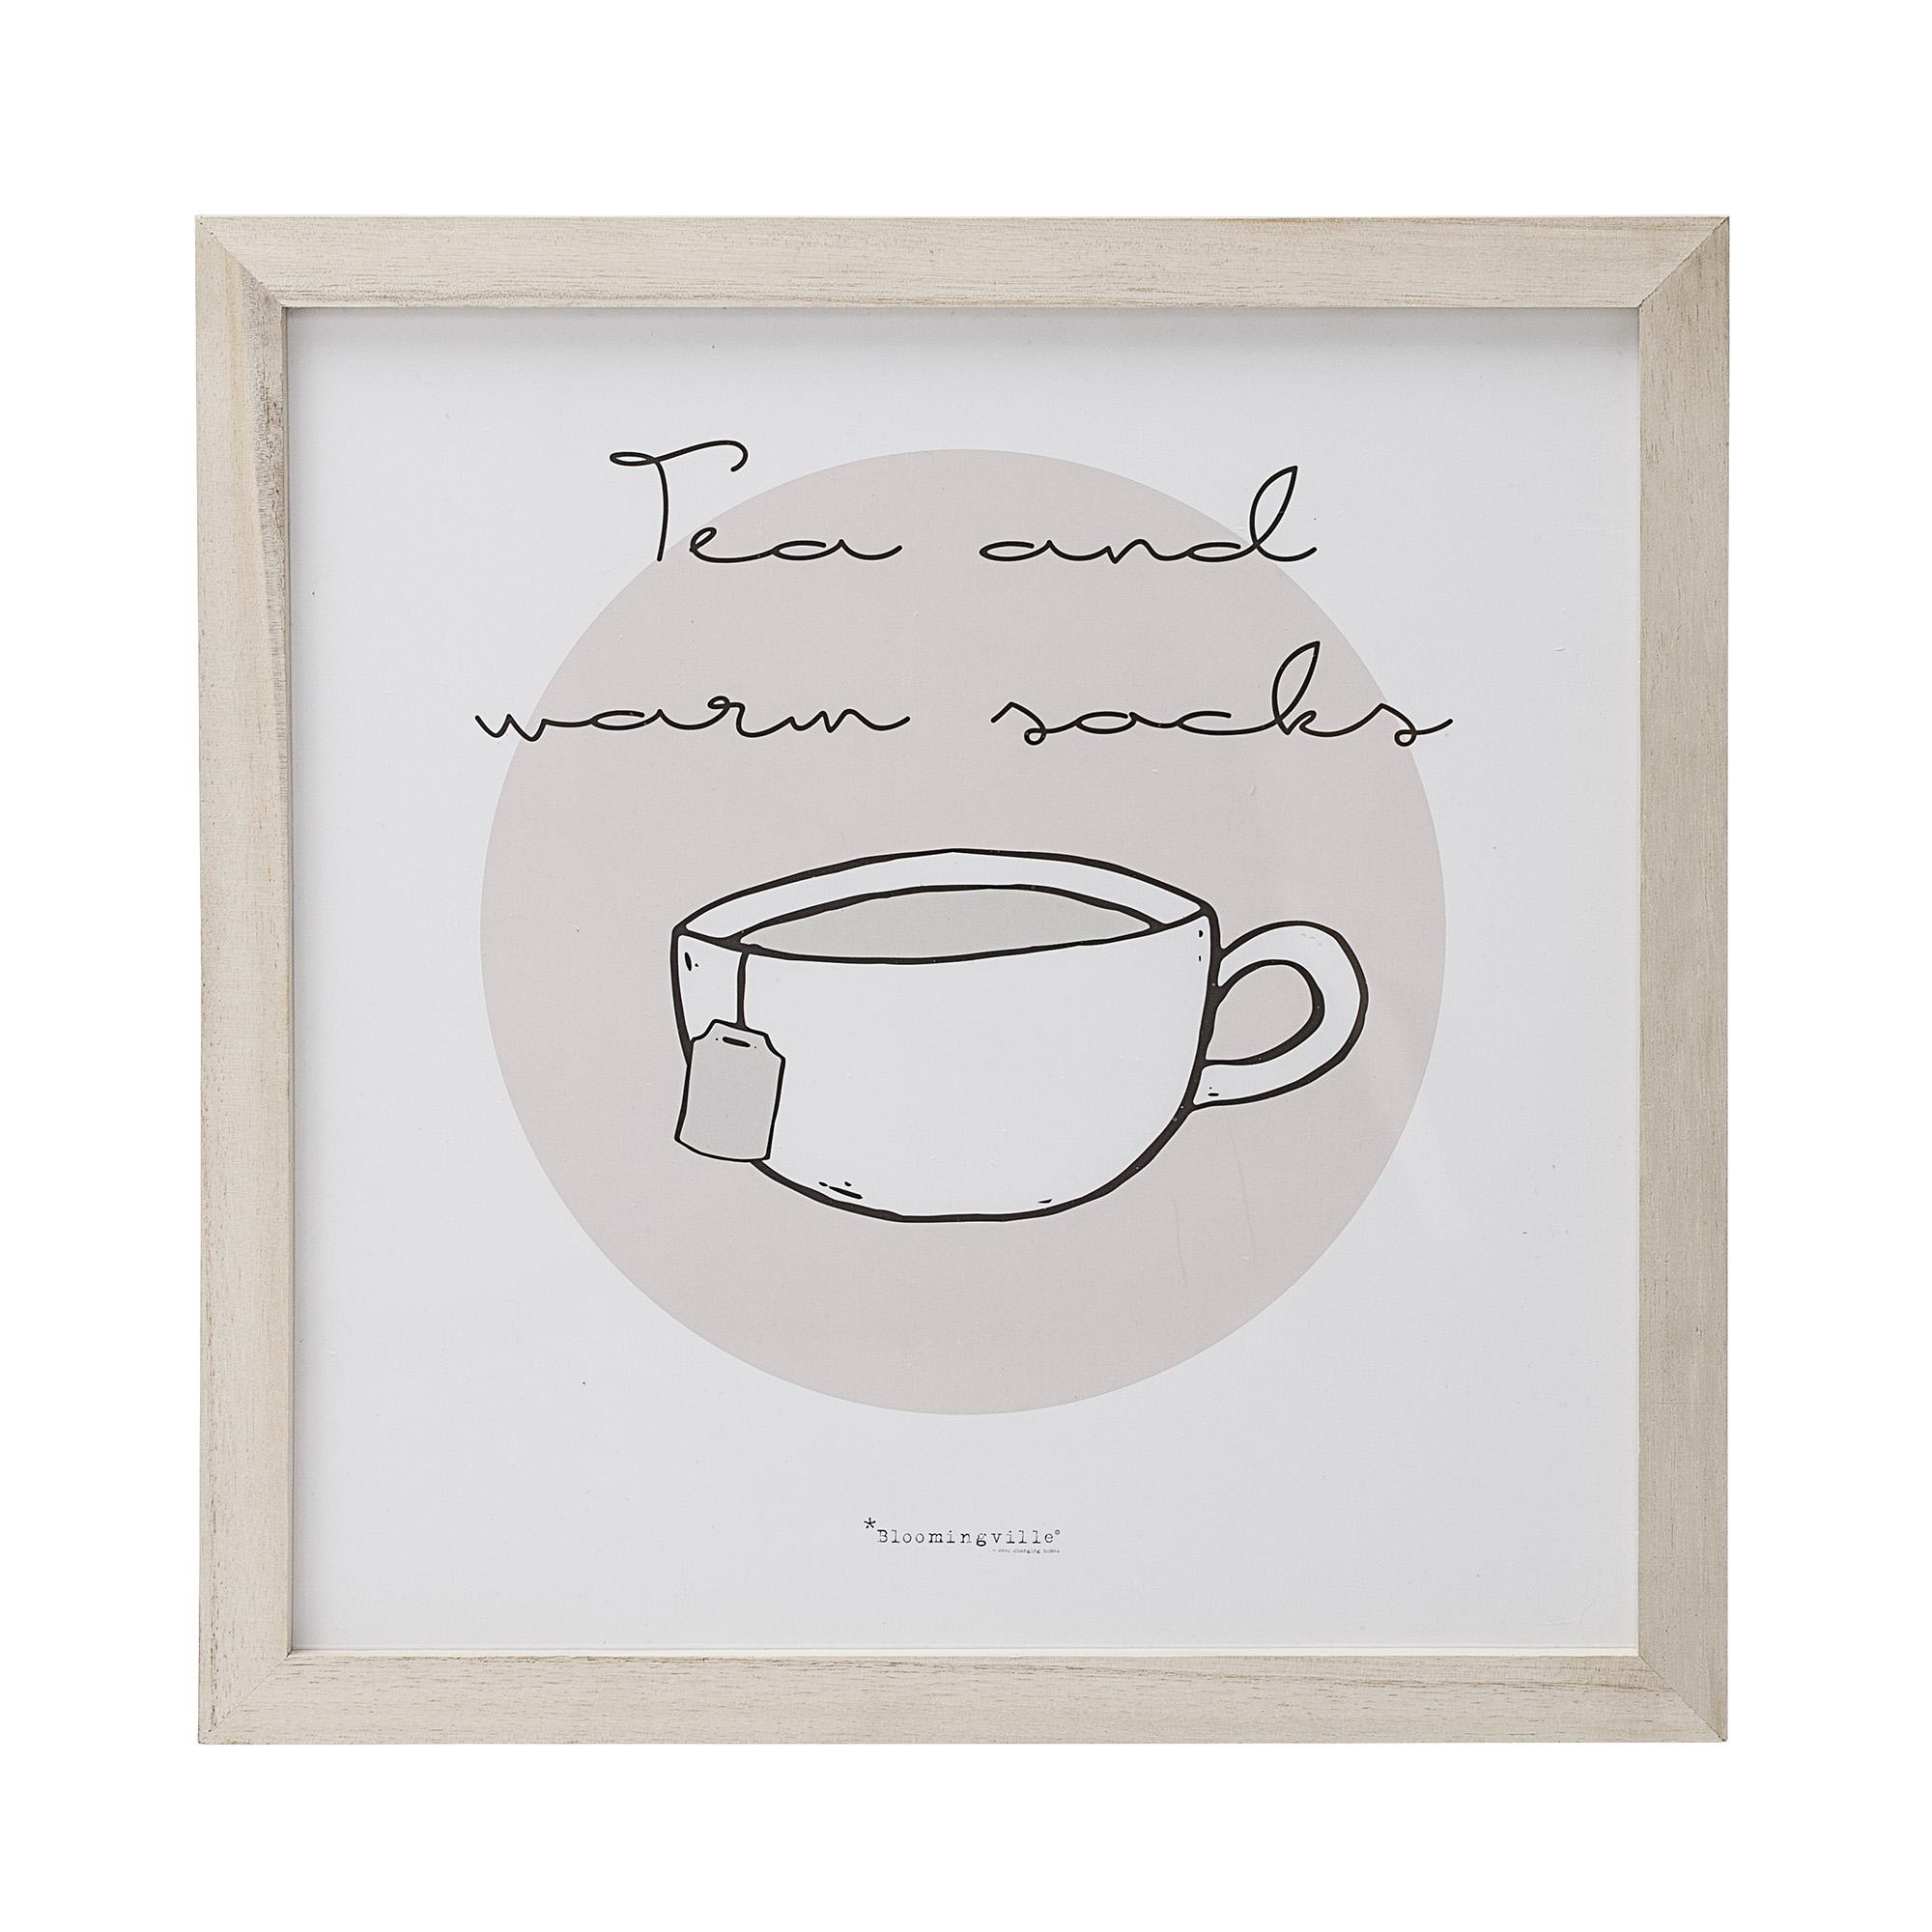 Witzigschilder - Bild in Naturholzrahmen Tea and warm socks - Onlineshop Tante Emmer